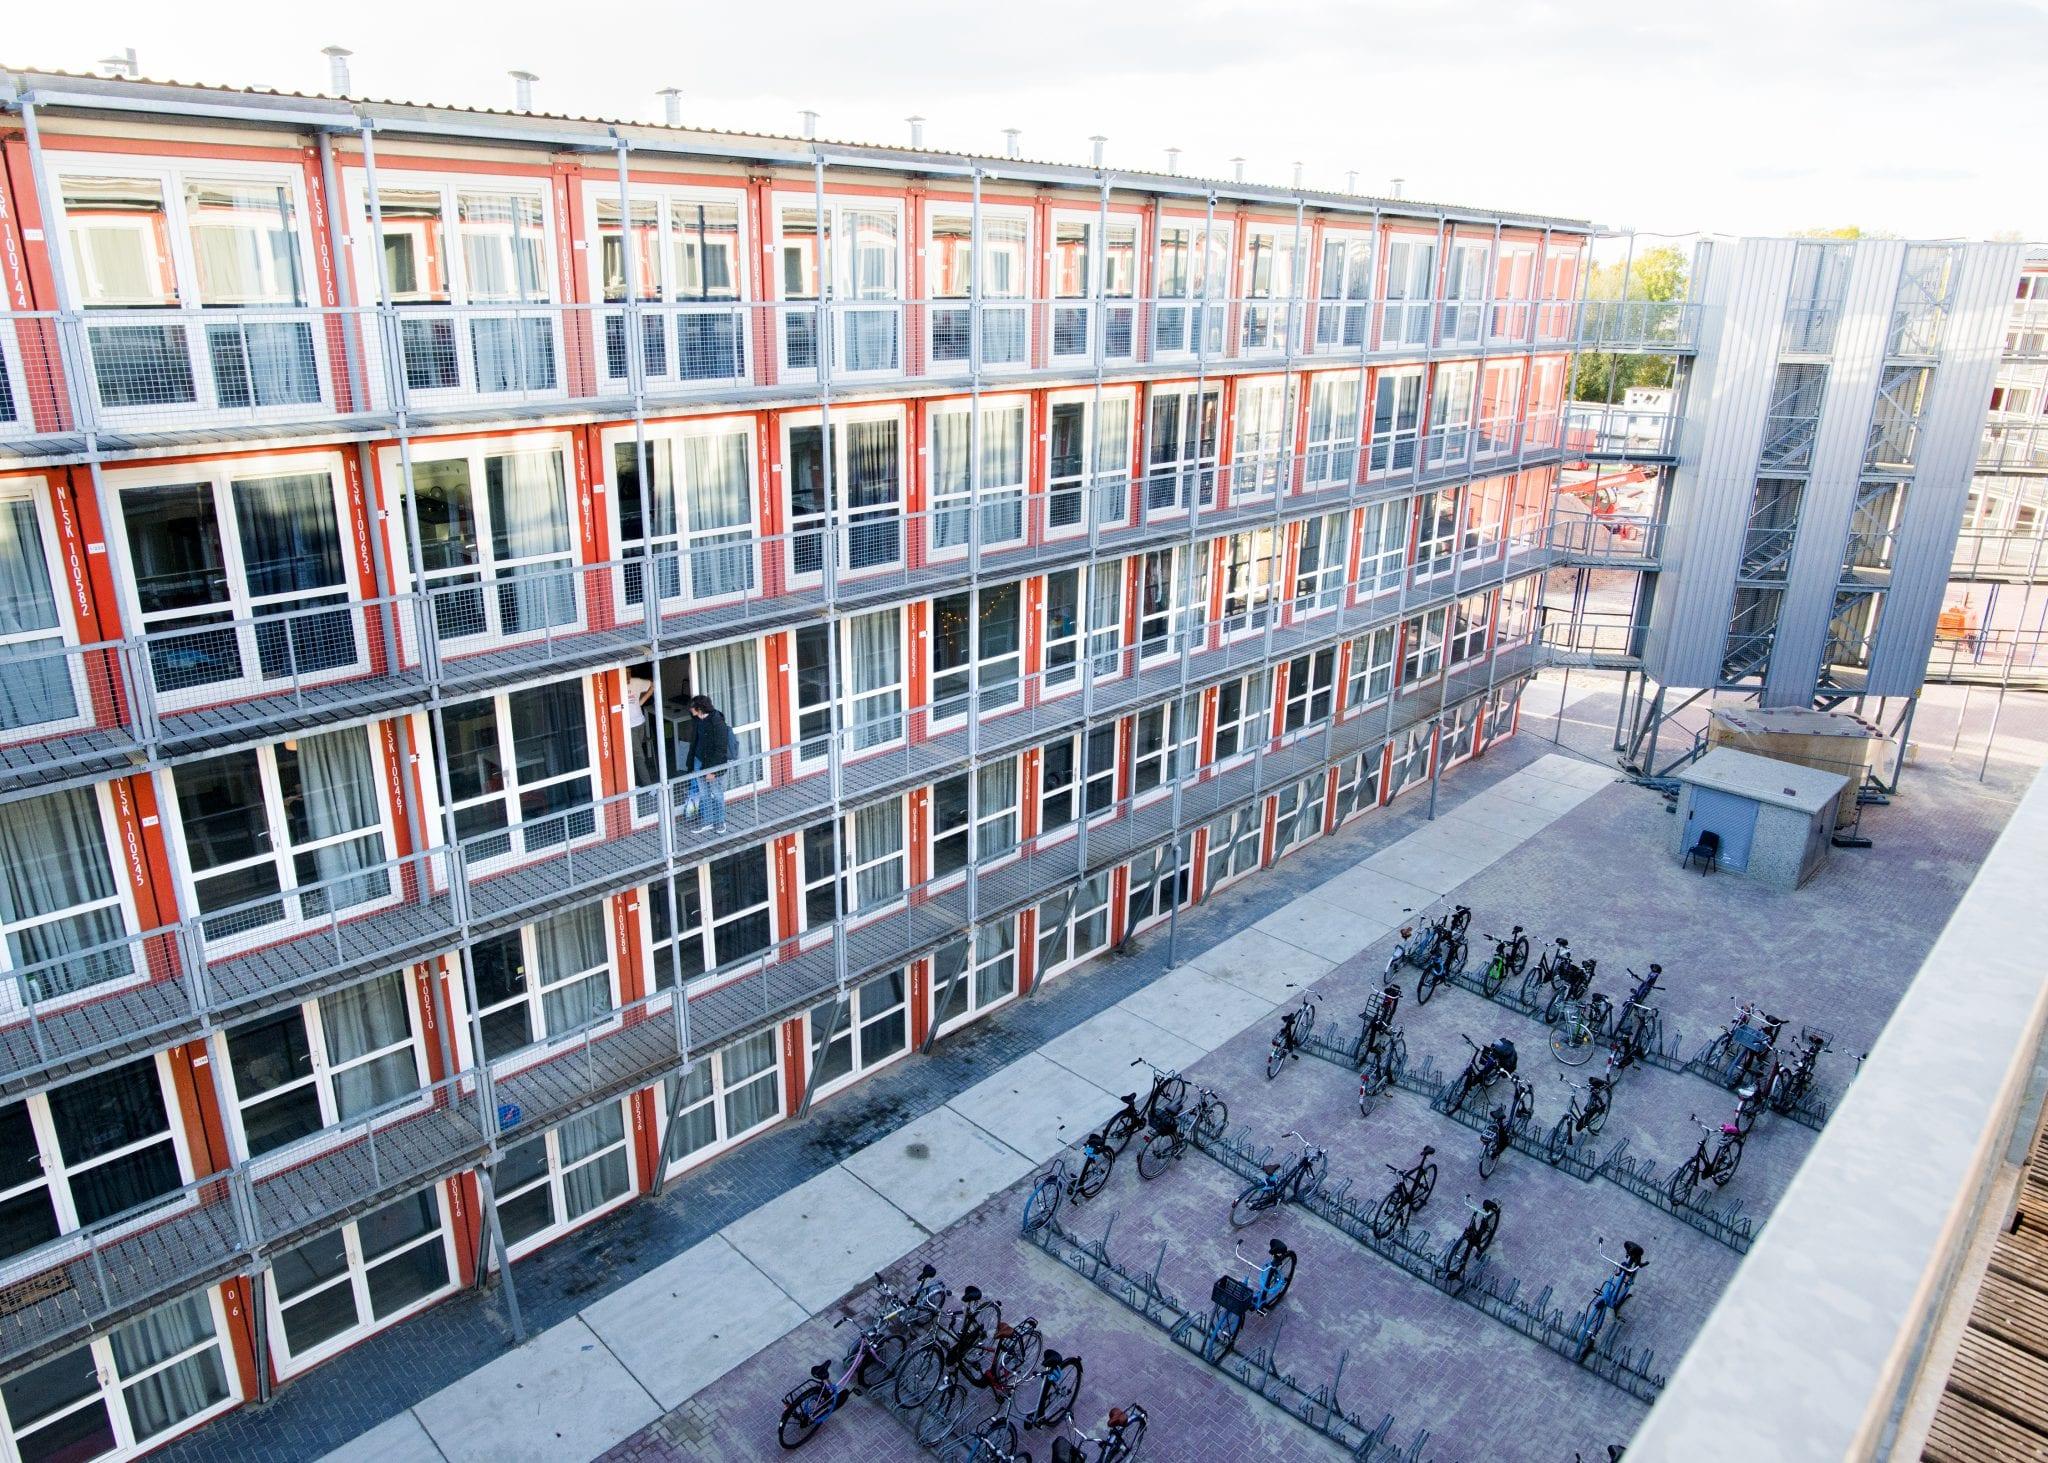 International student housing: is it